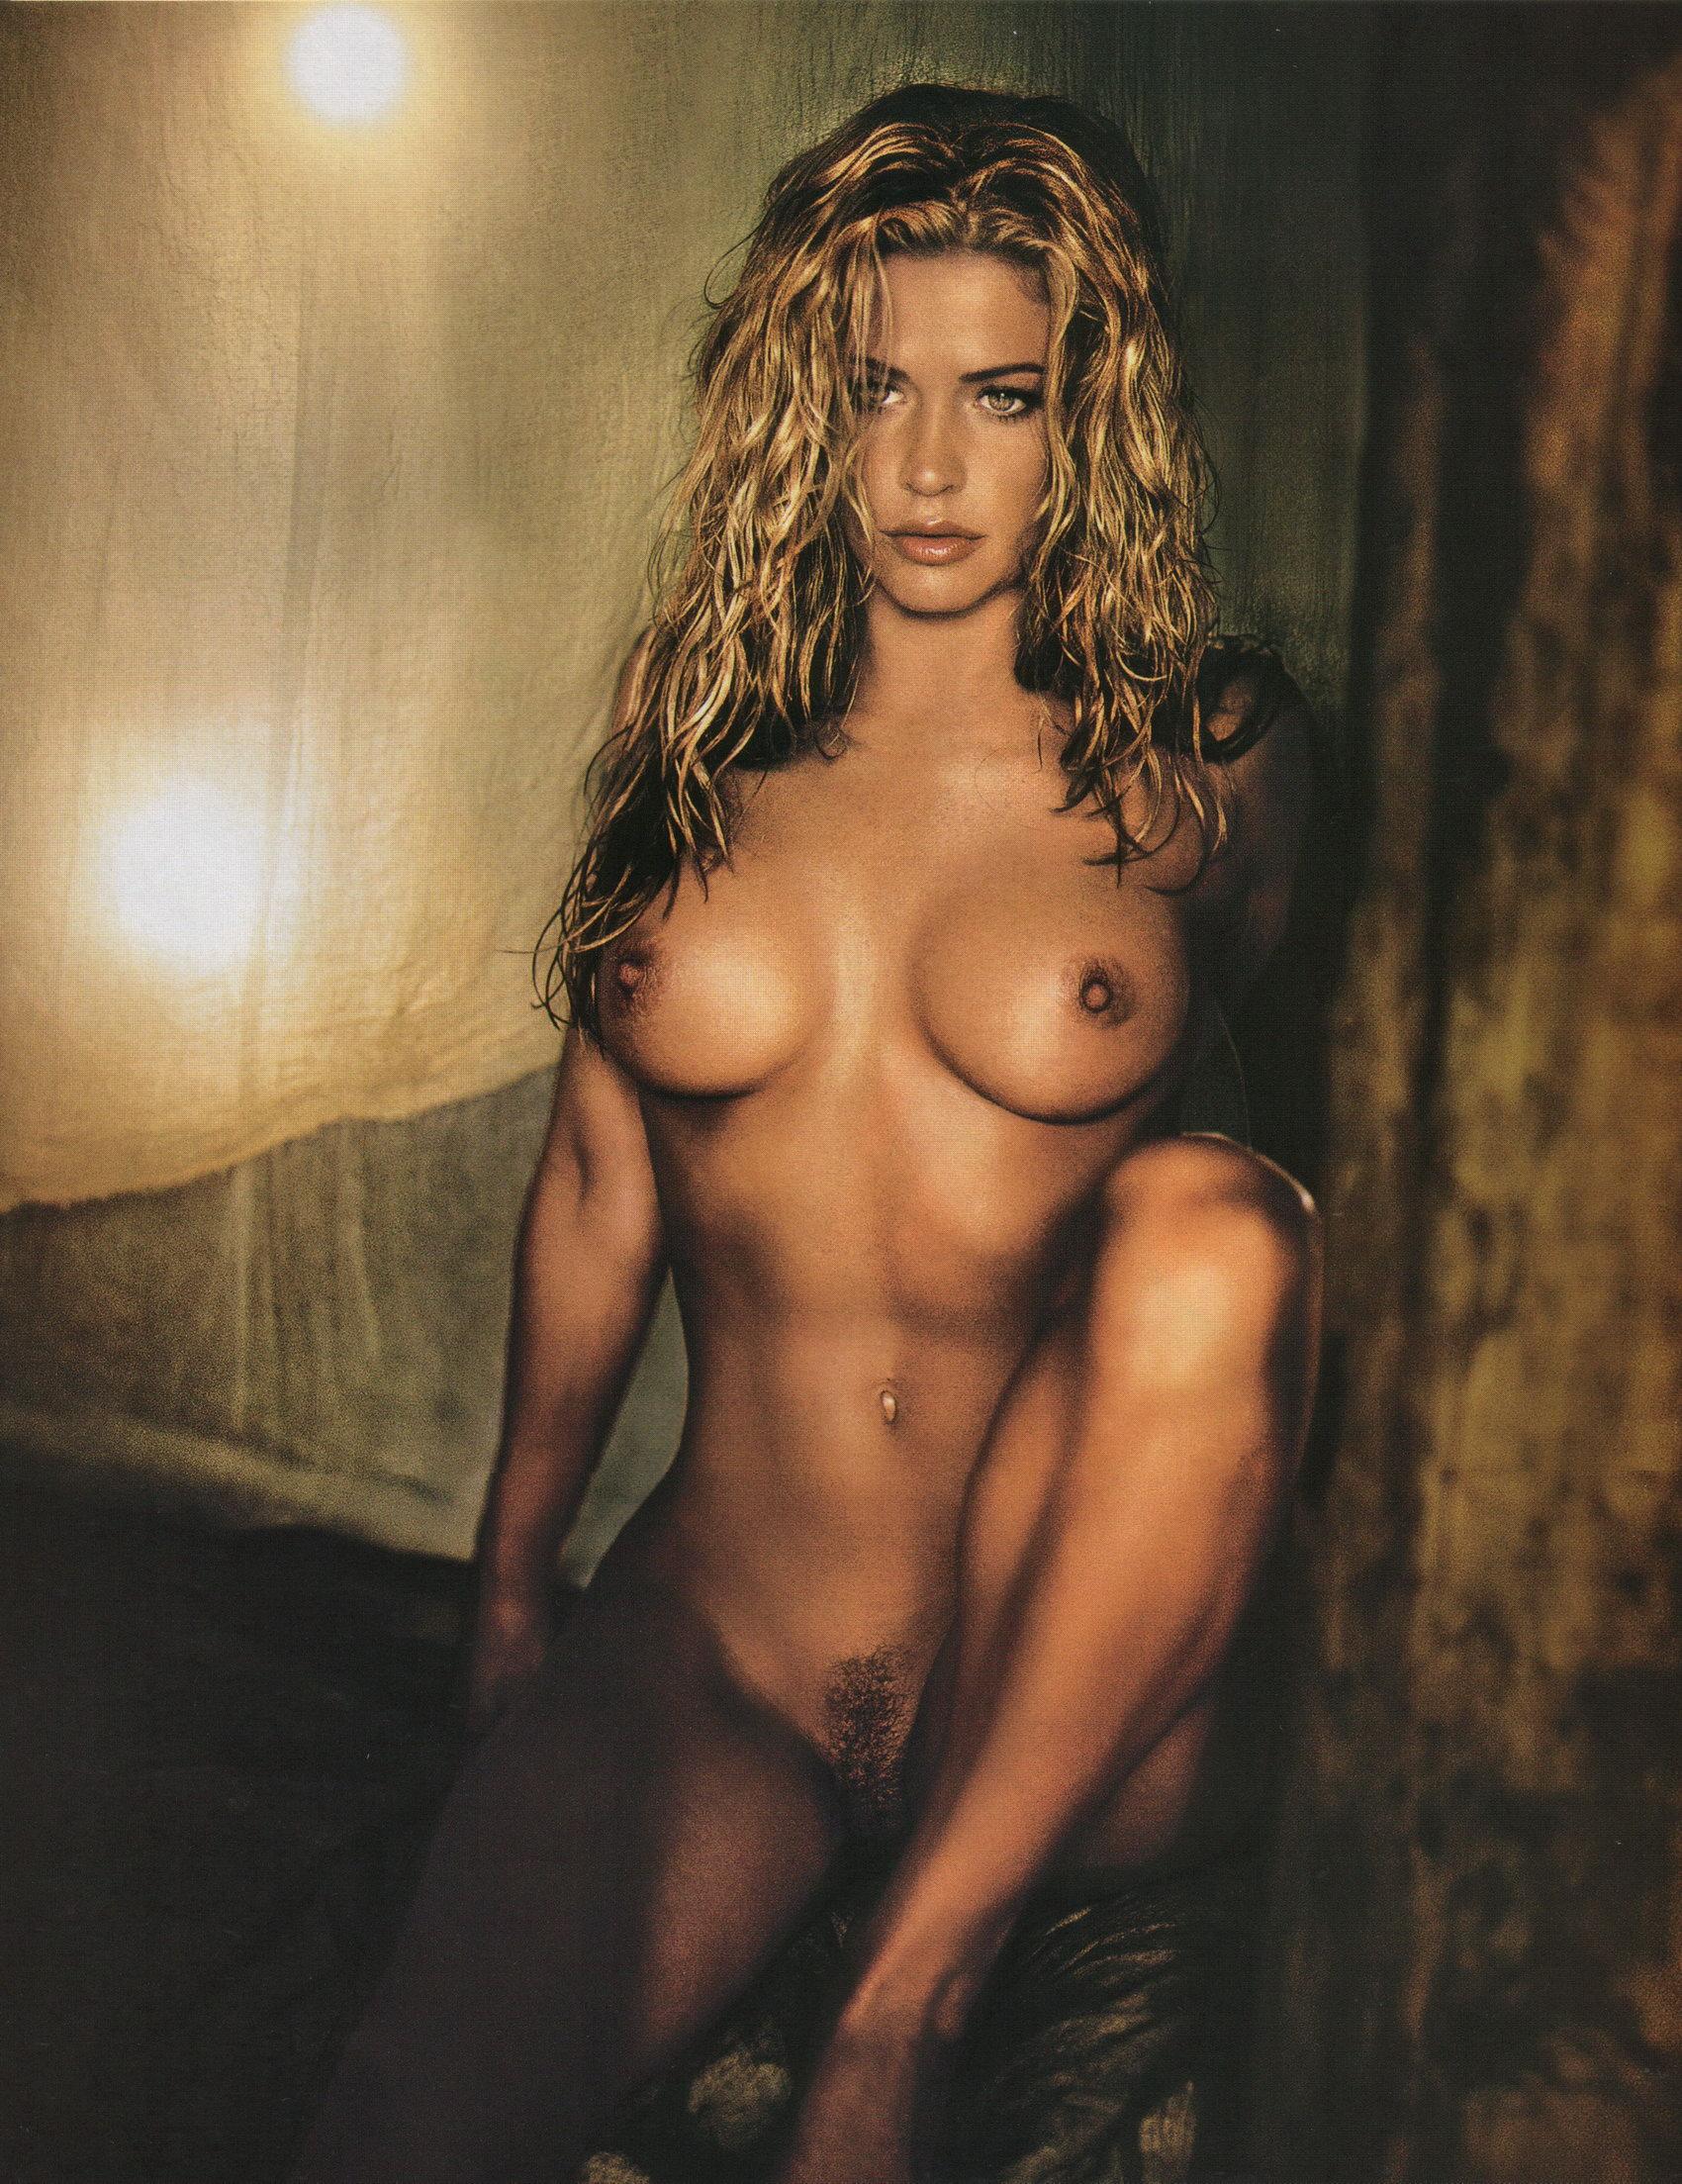 Jillian nackt Swanson Tricia Helfer